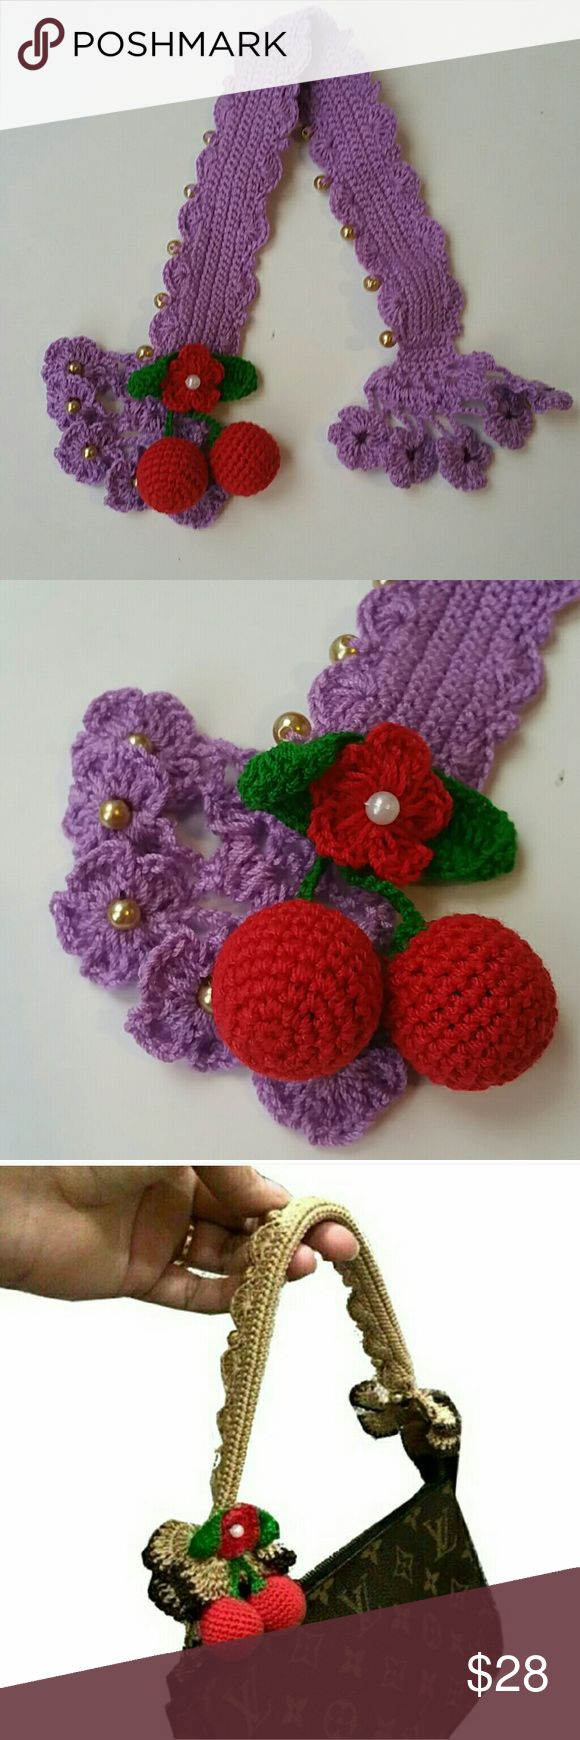 Crochet handle Cover for Louis Vuitton Pochette Crochet handle Cover for Louis Vuitton Pochette/coach wristlet bag. Button closure. Come with cherries charm. Accessories